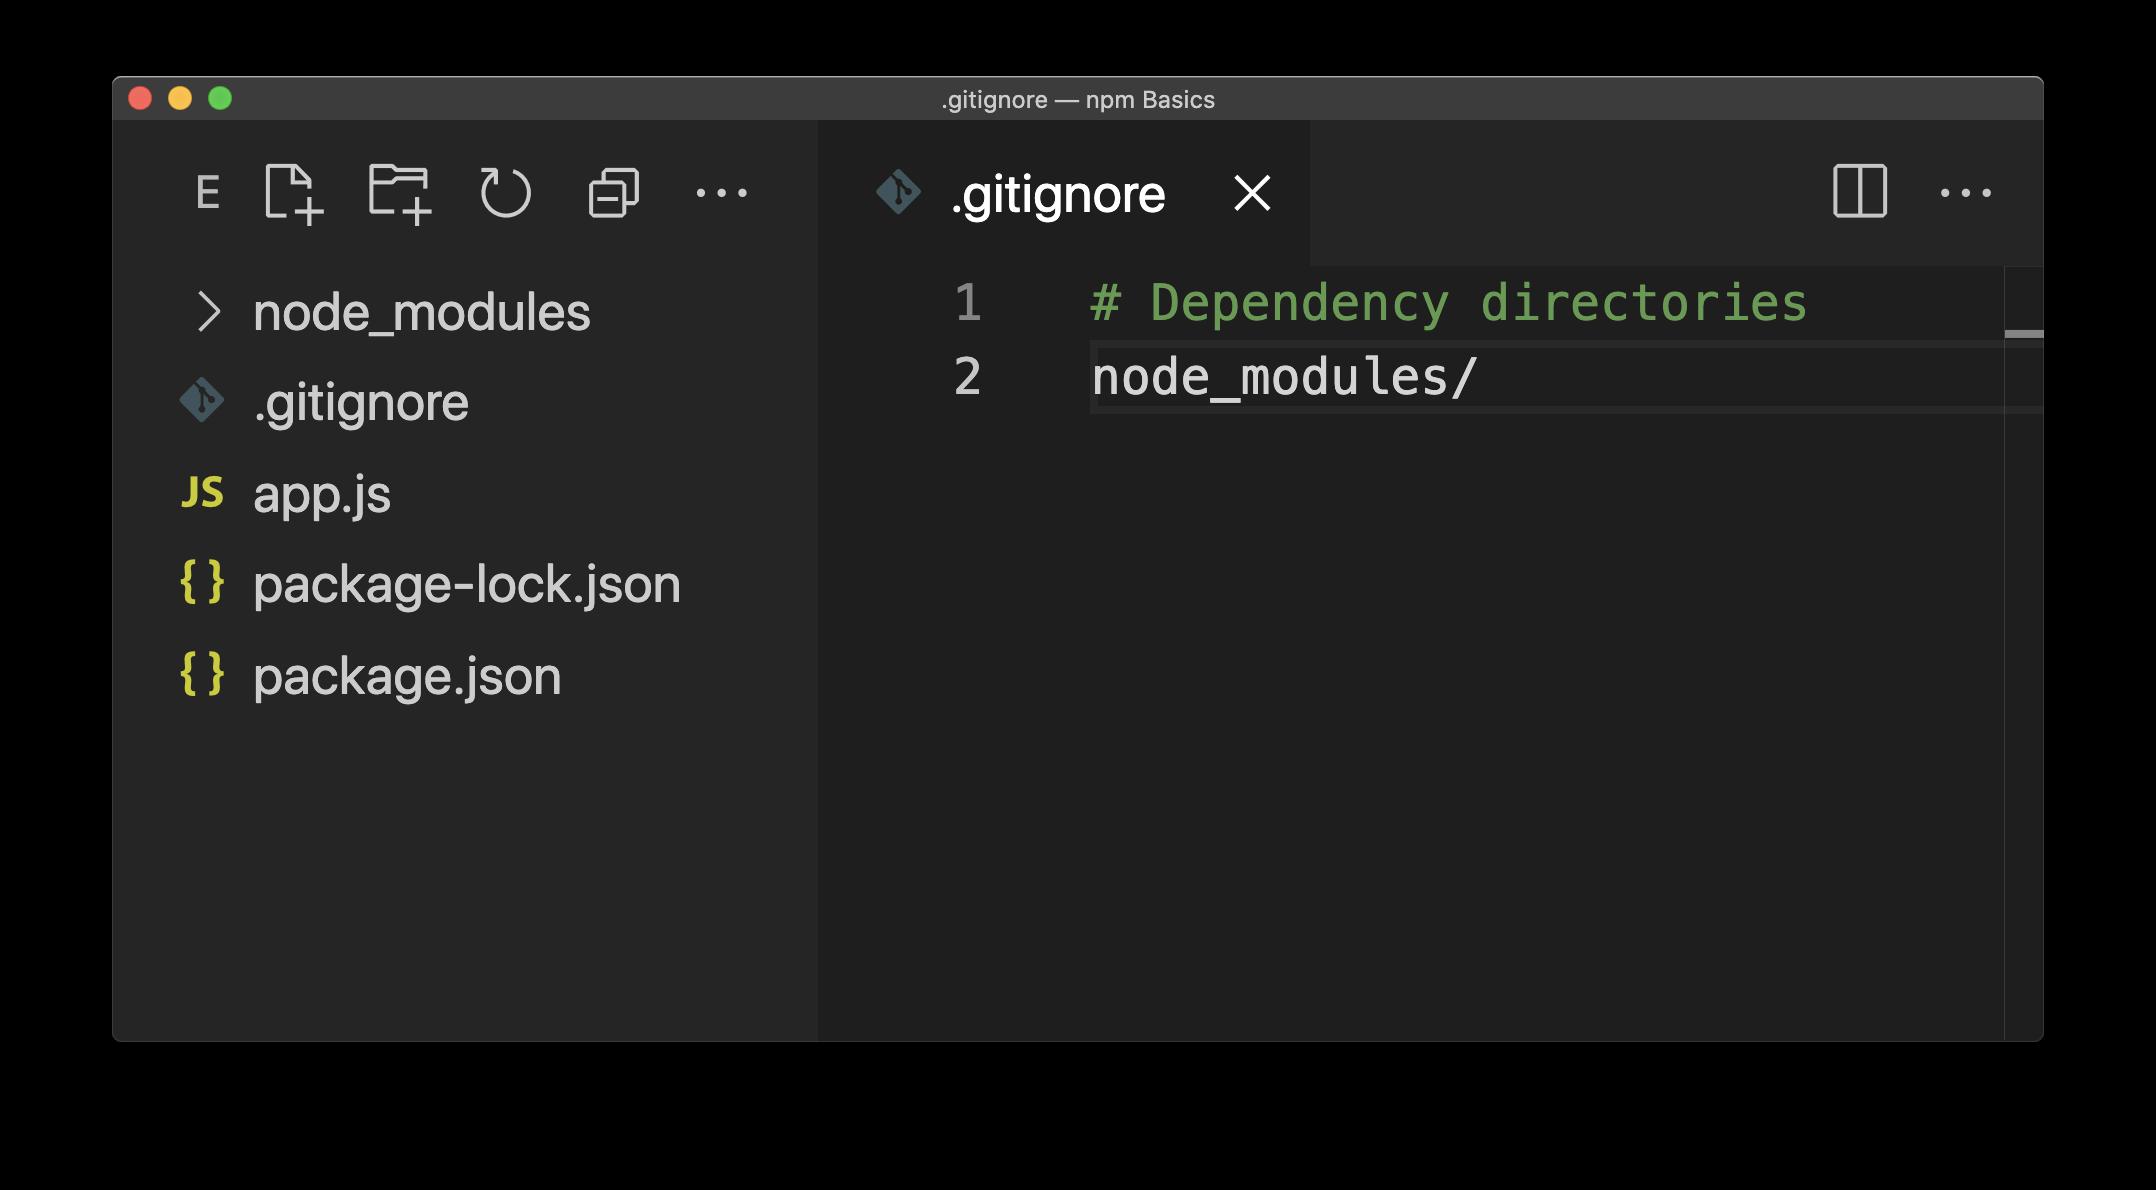 A .gitignore file listing the node_modules directory